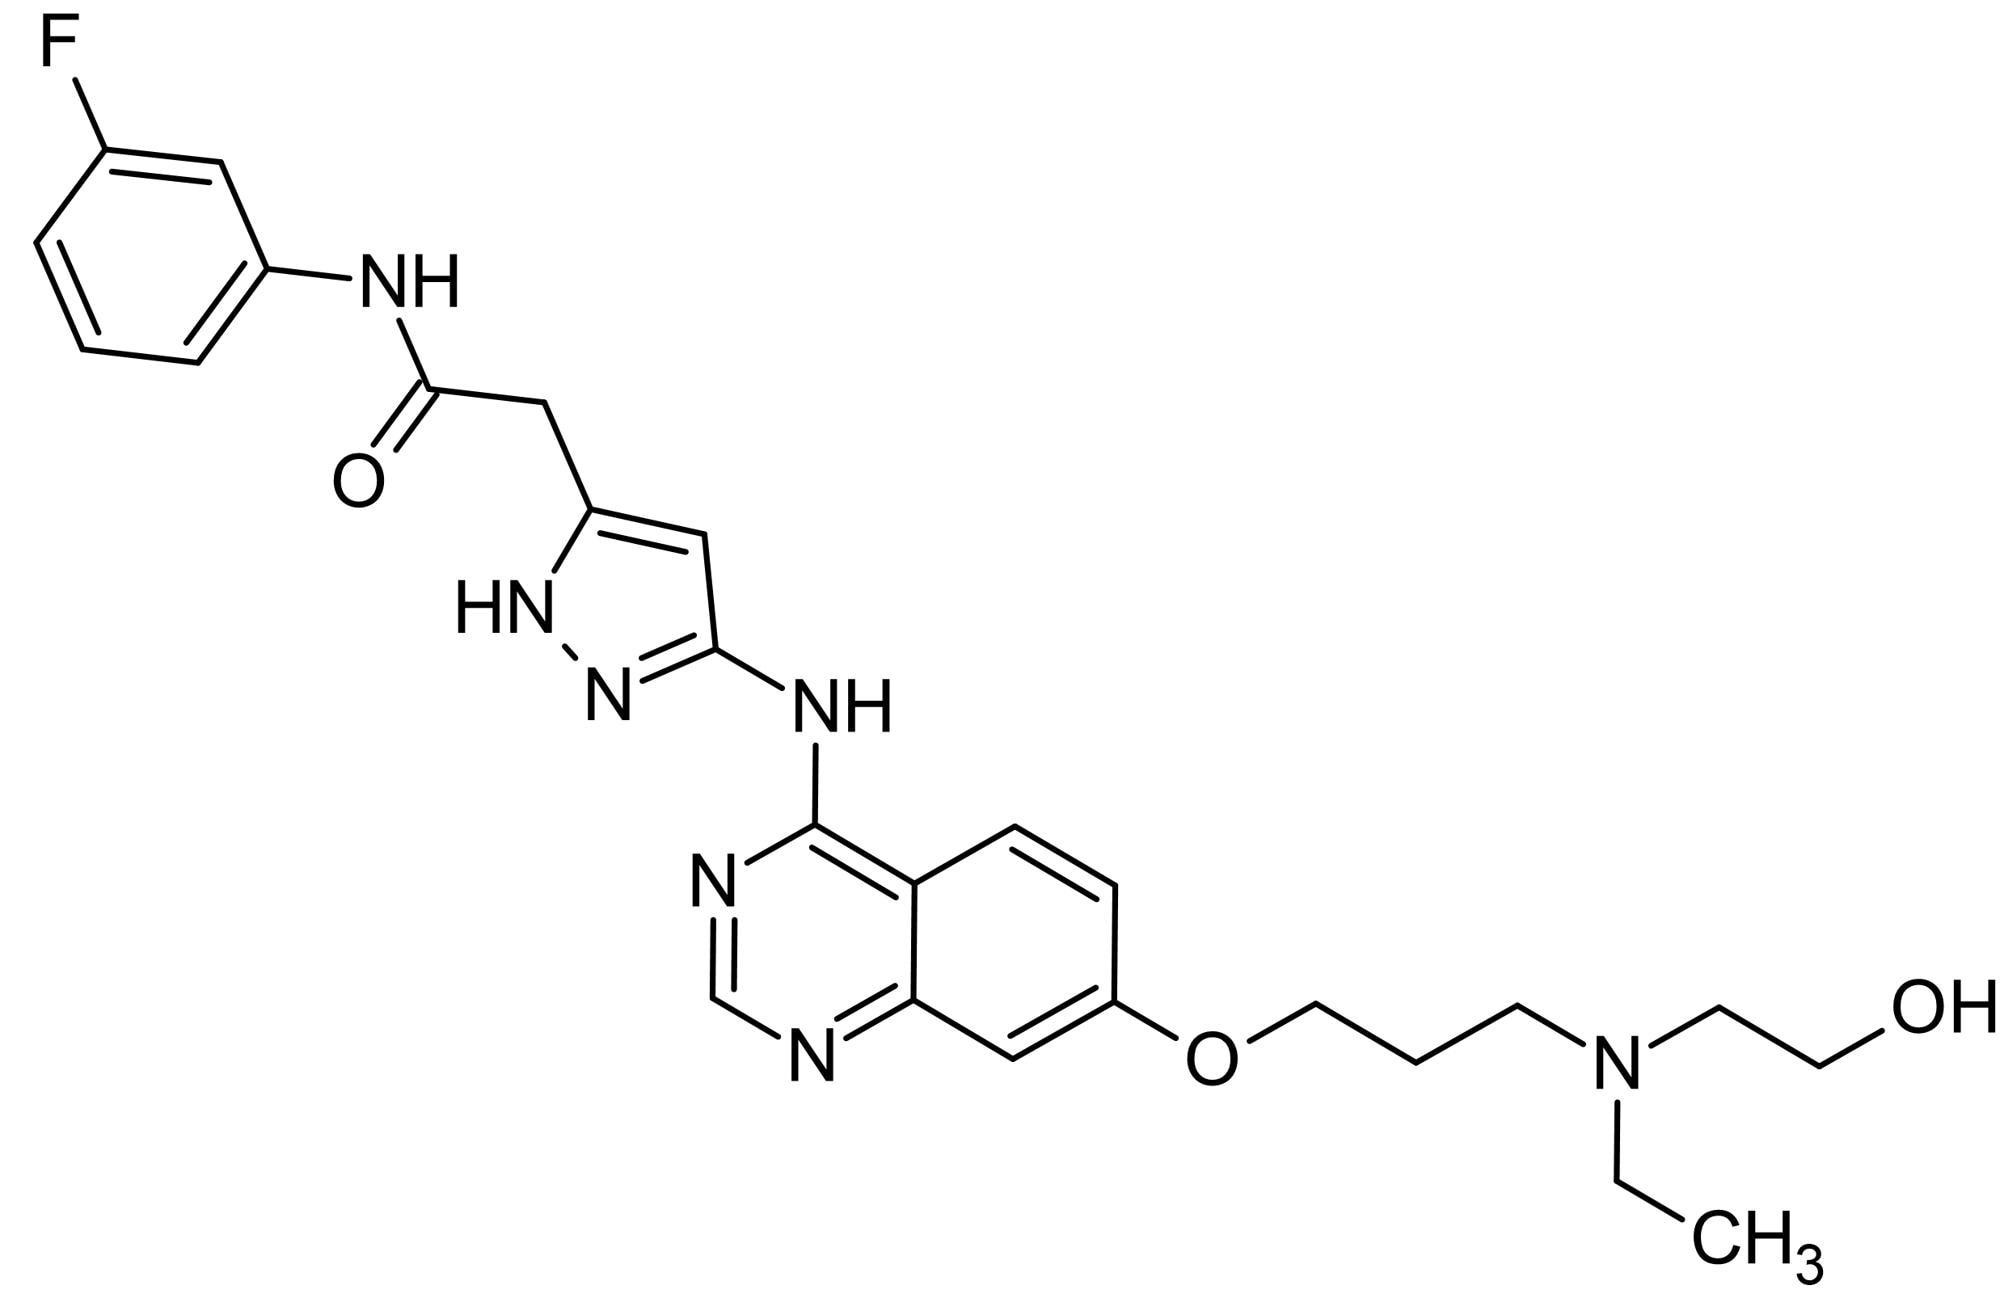 Chemical Structure - AZD1152-HQPA, Aurora B kinase inhibitor (ab142049)